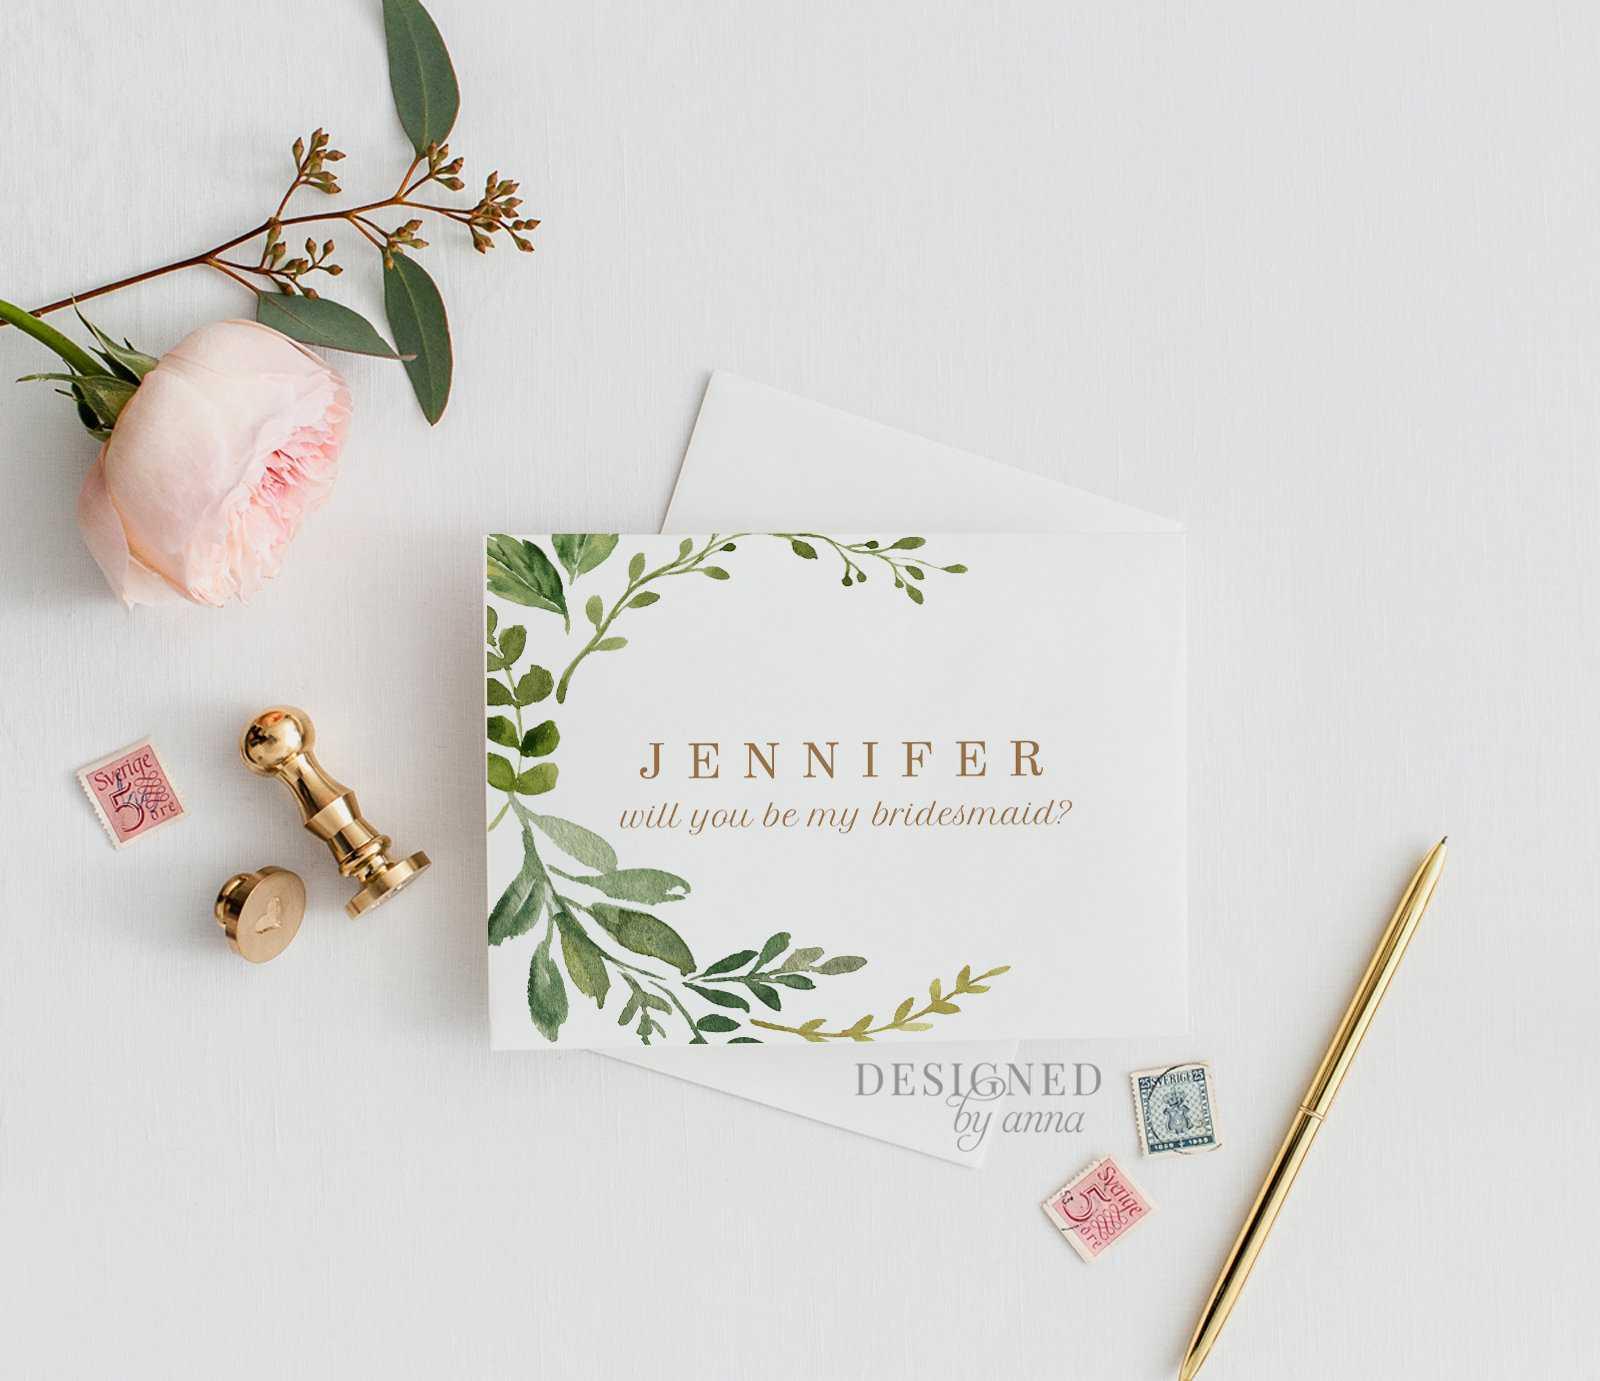 Greenery Bridesmaid Card Printable Will You Be My Bridesmaid Design  Watercolor Botanical Bridesmaid Proposal Editable Template [Id:1602994] Pertaining To Will You Be My Bridesmaid Card Template